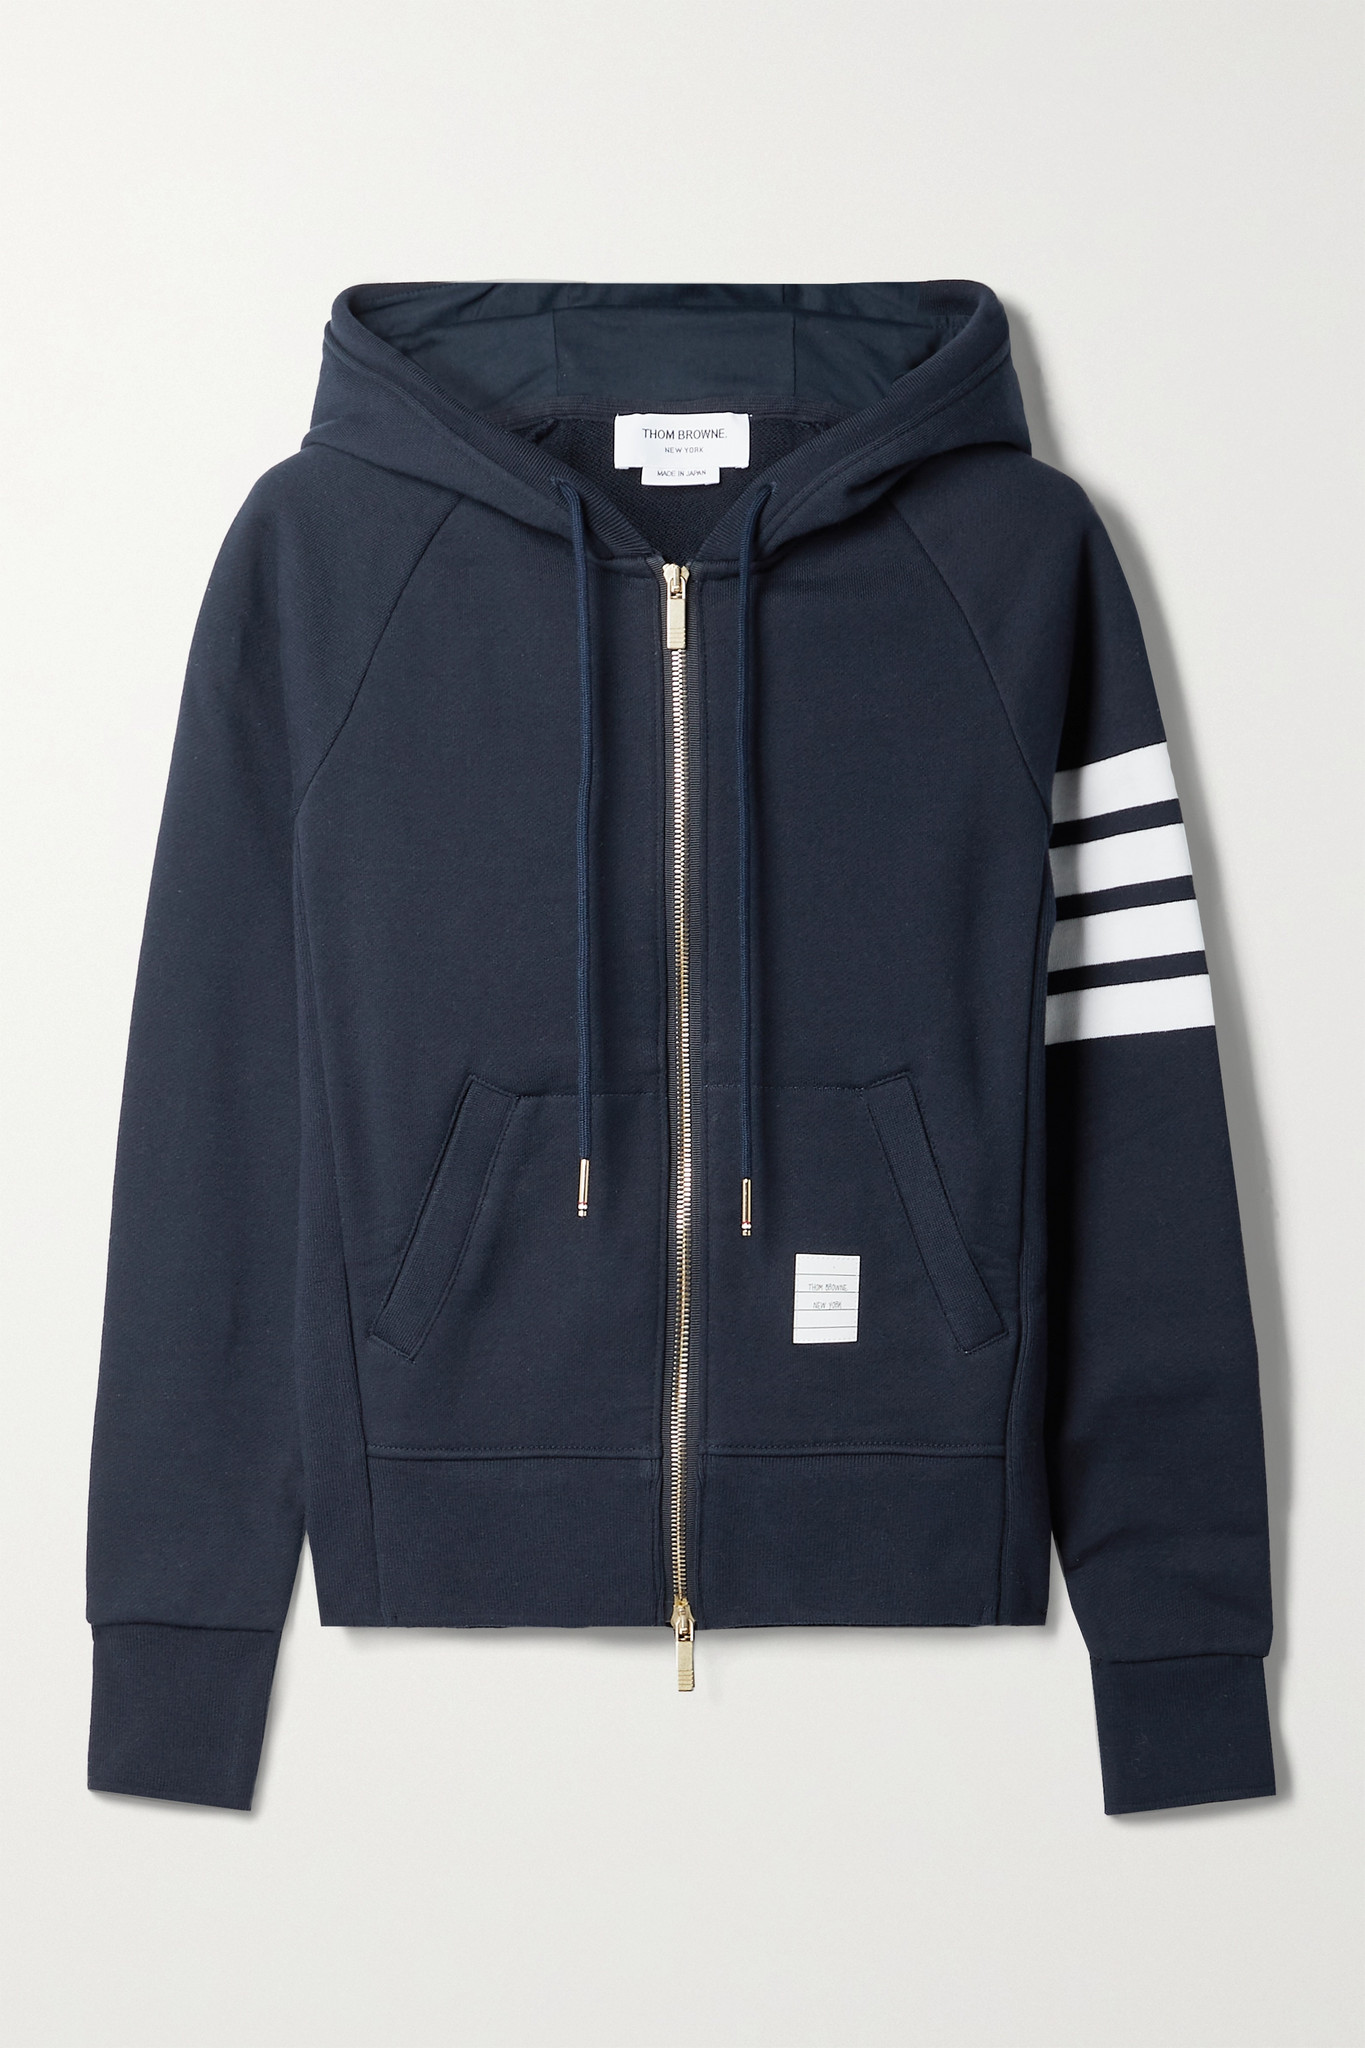 THOM BROWNE - 条纹纯棉平纹布帽衫 - 蓝色 - IT42